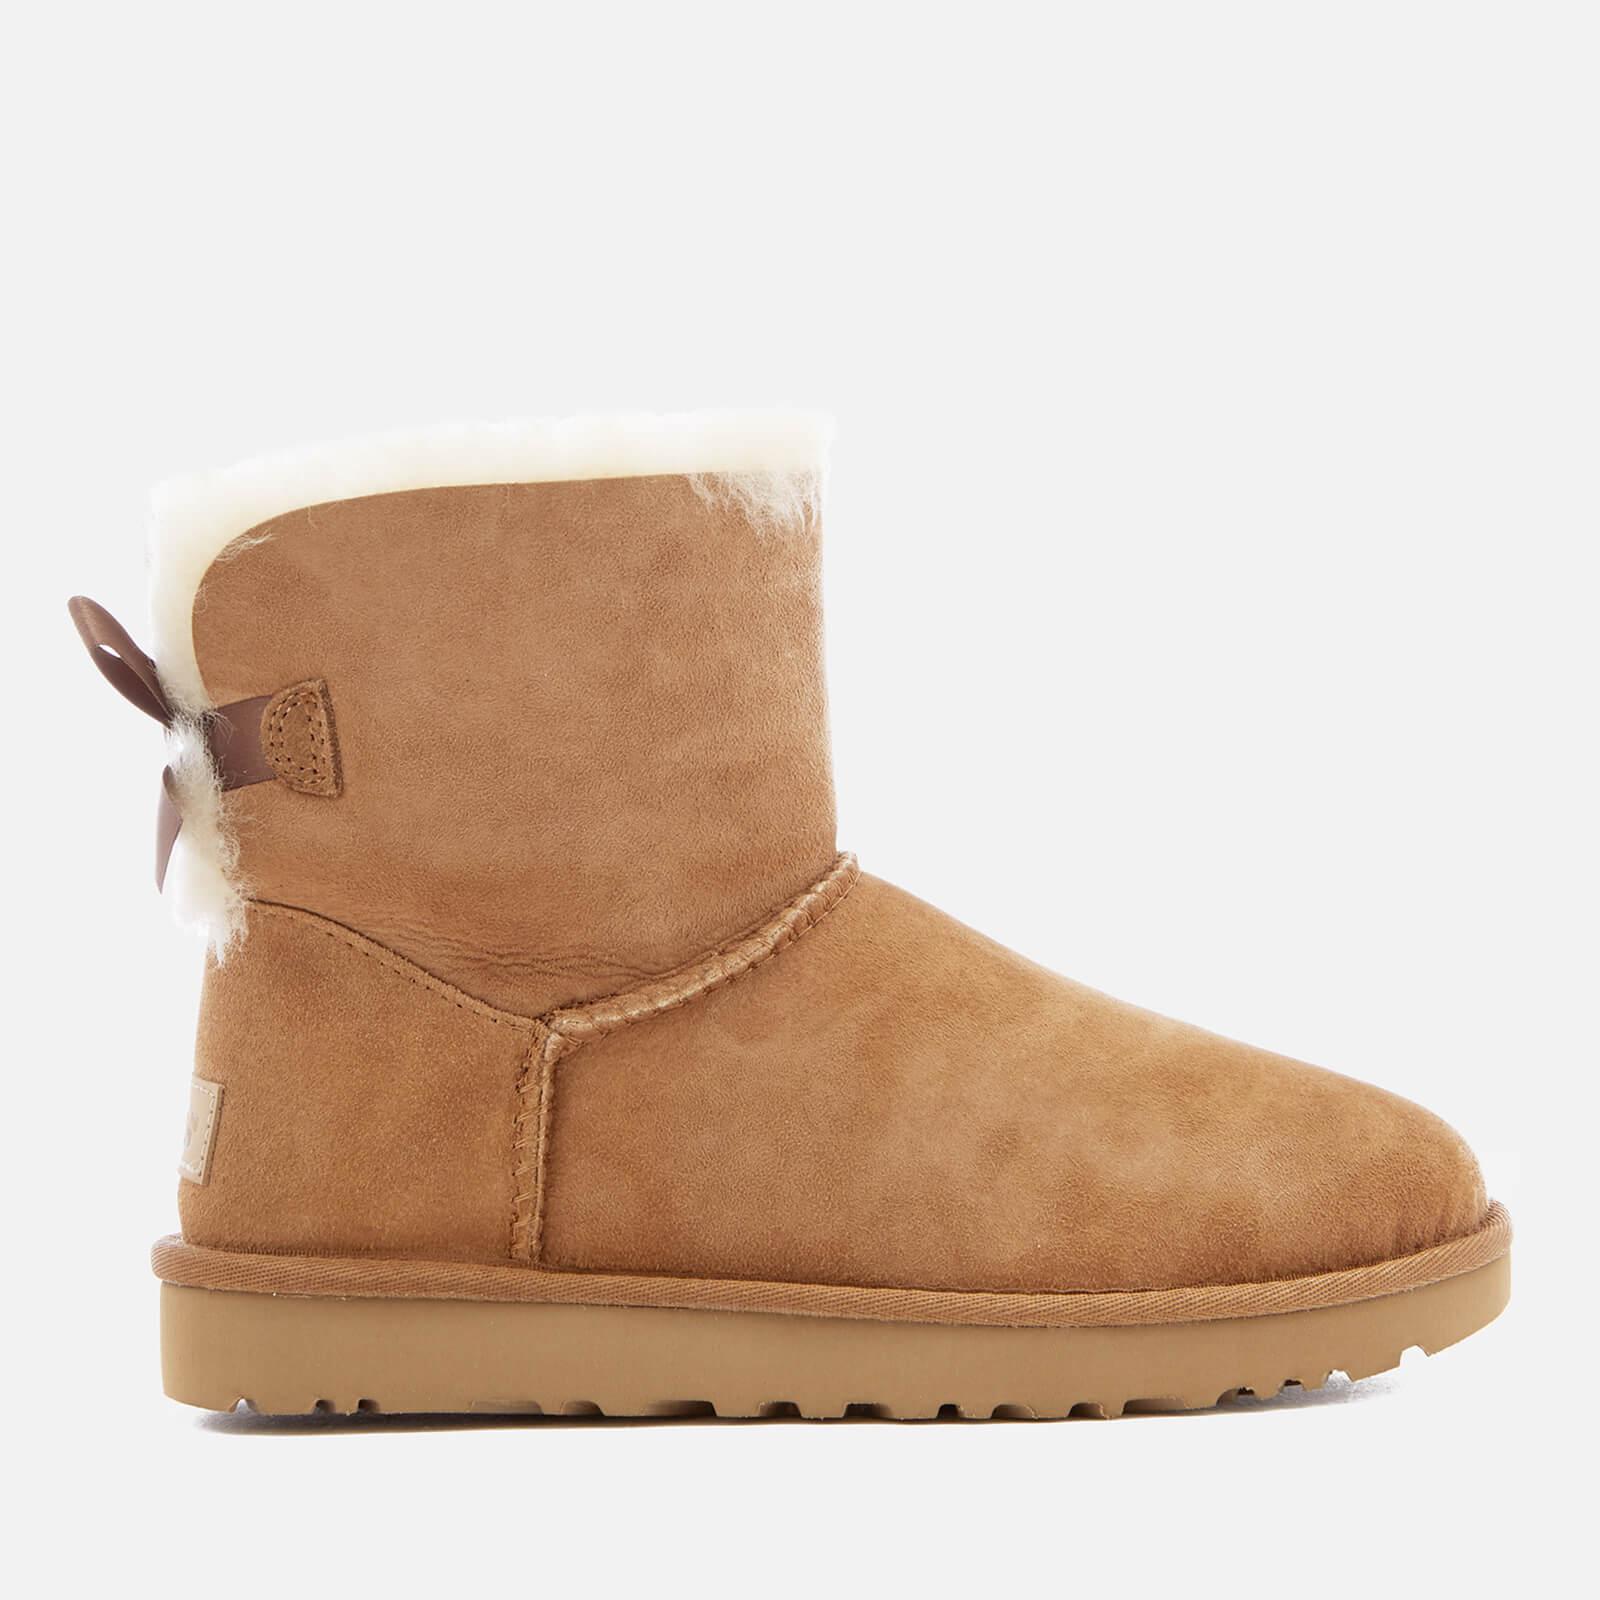 UGG Women's Mini Bailey Bow II Sheepskin Boots - Chestnut - UK 6